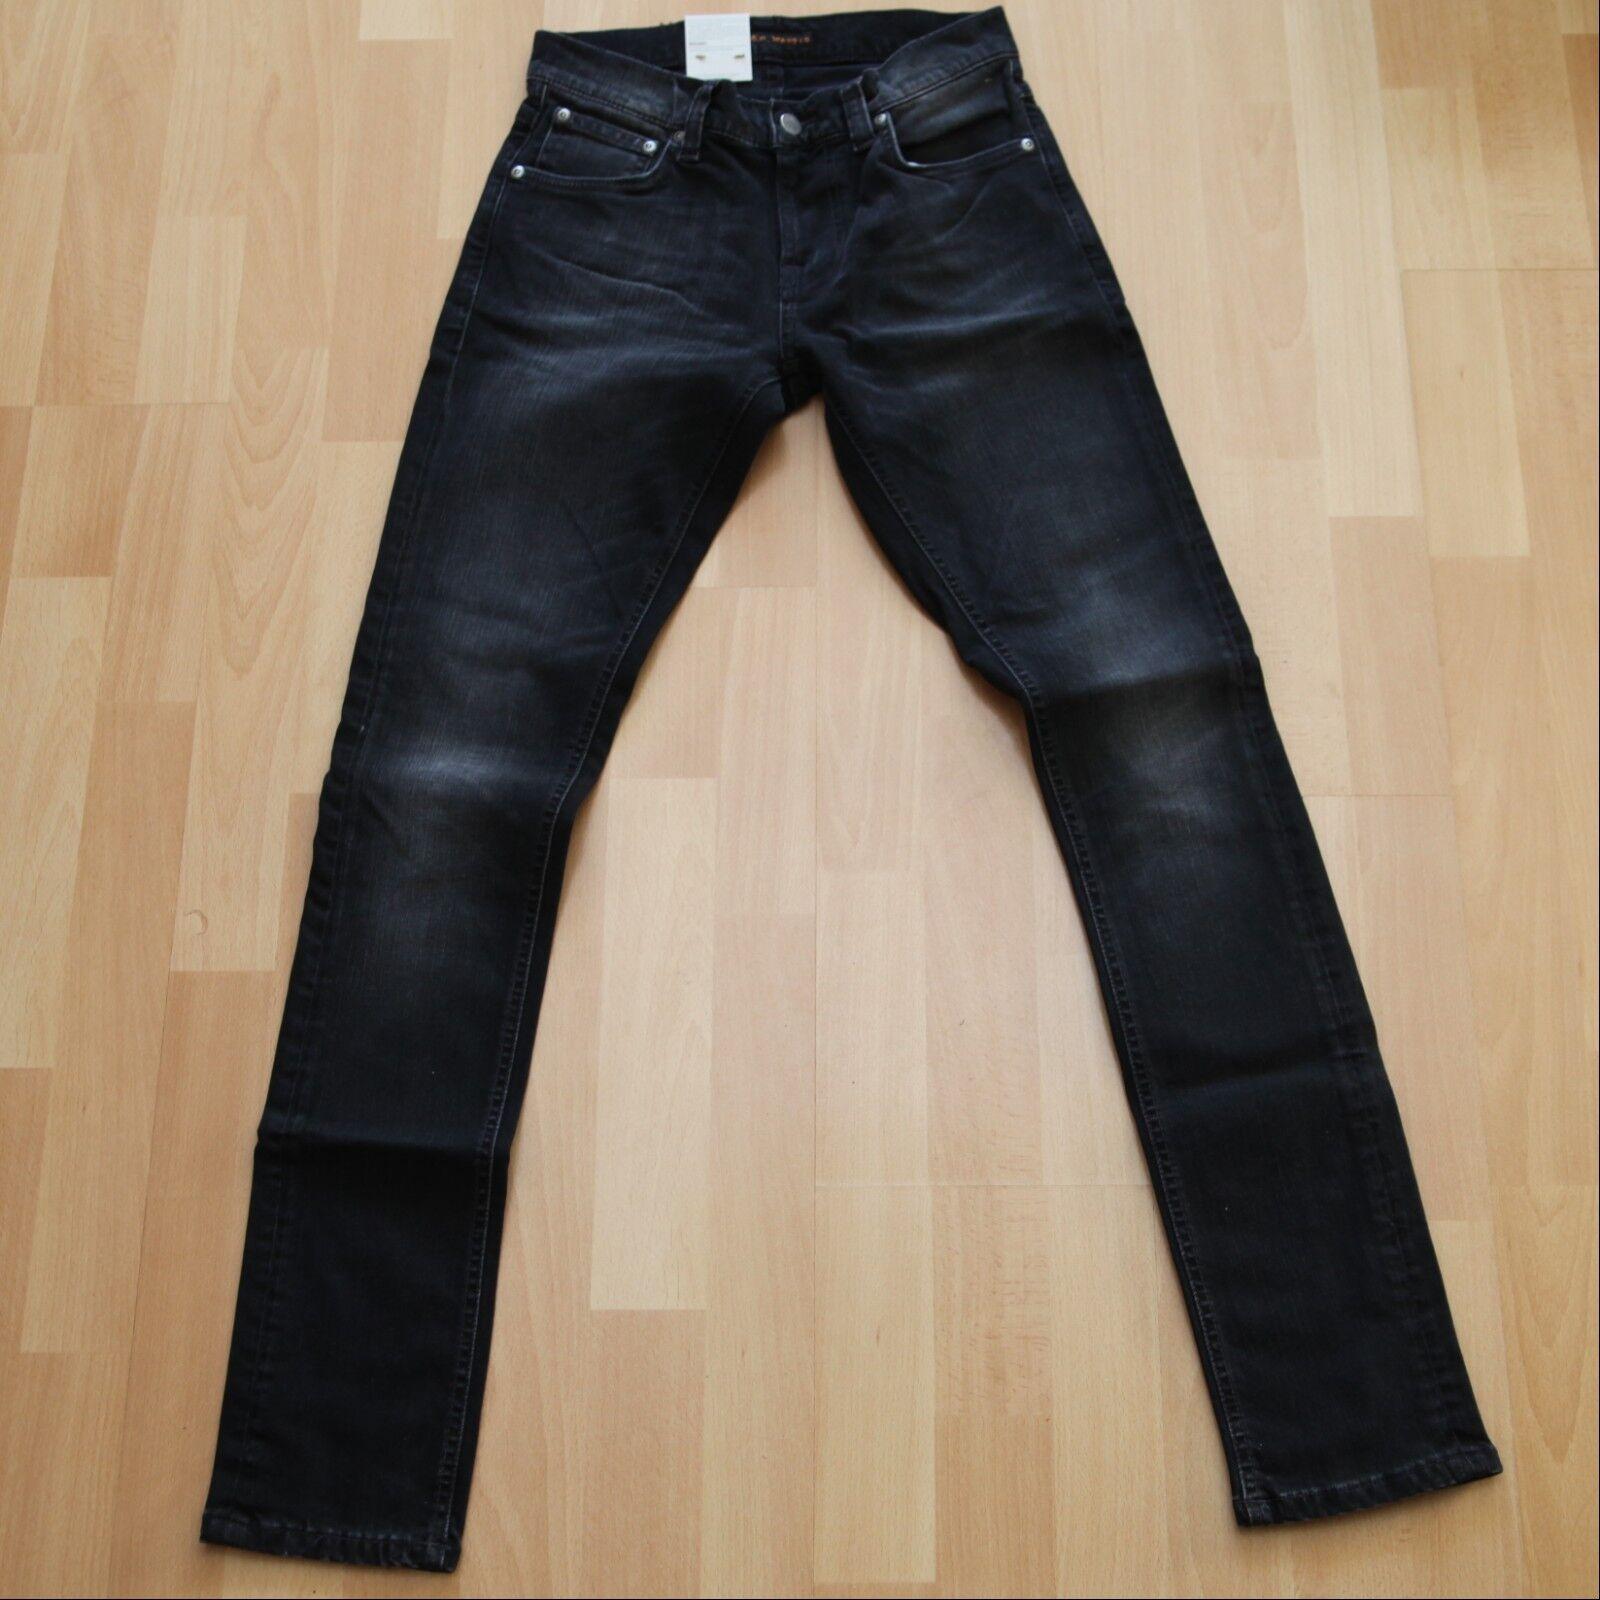 NEU Nudie Jeans Tight Terry (Tight Antifit) Rainy schwarz 28 32